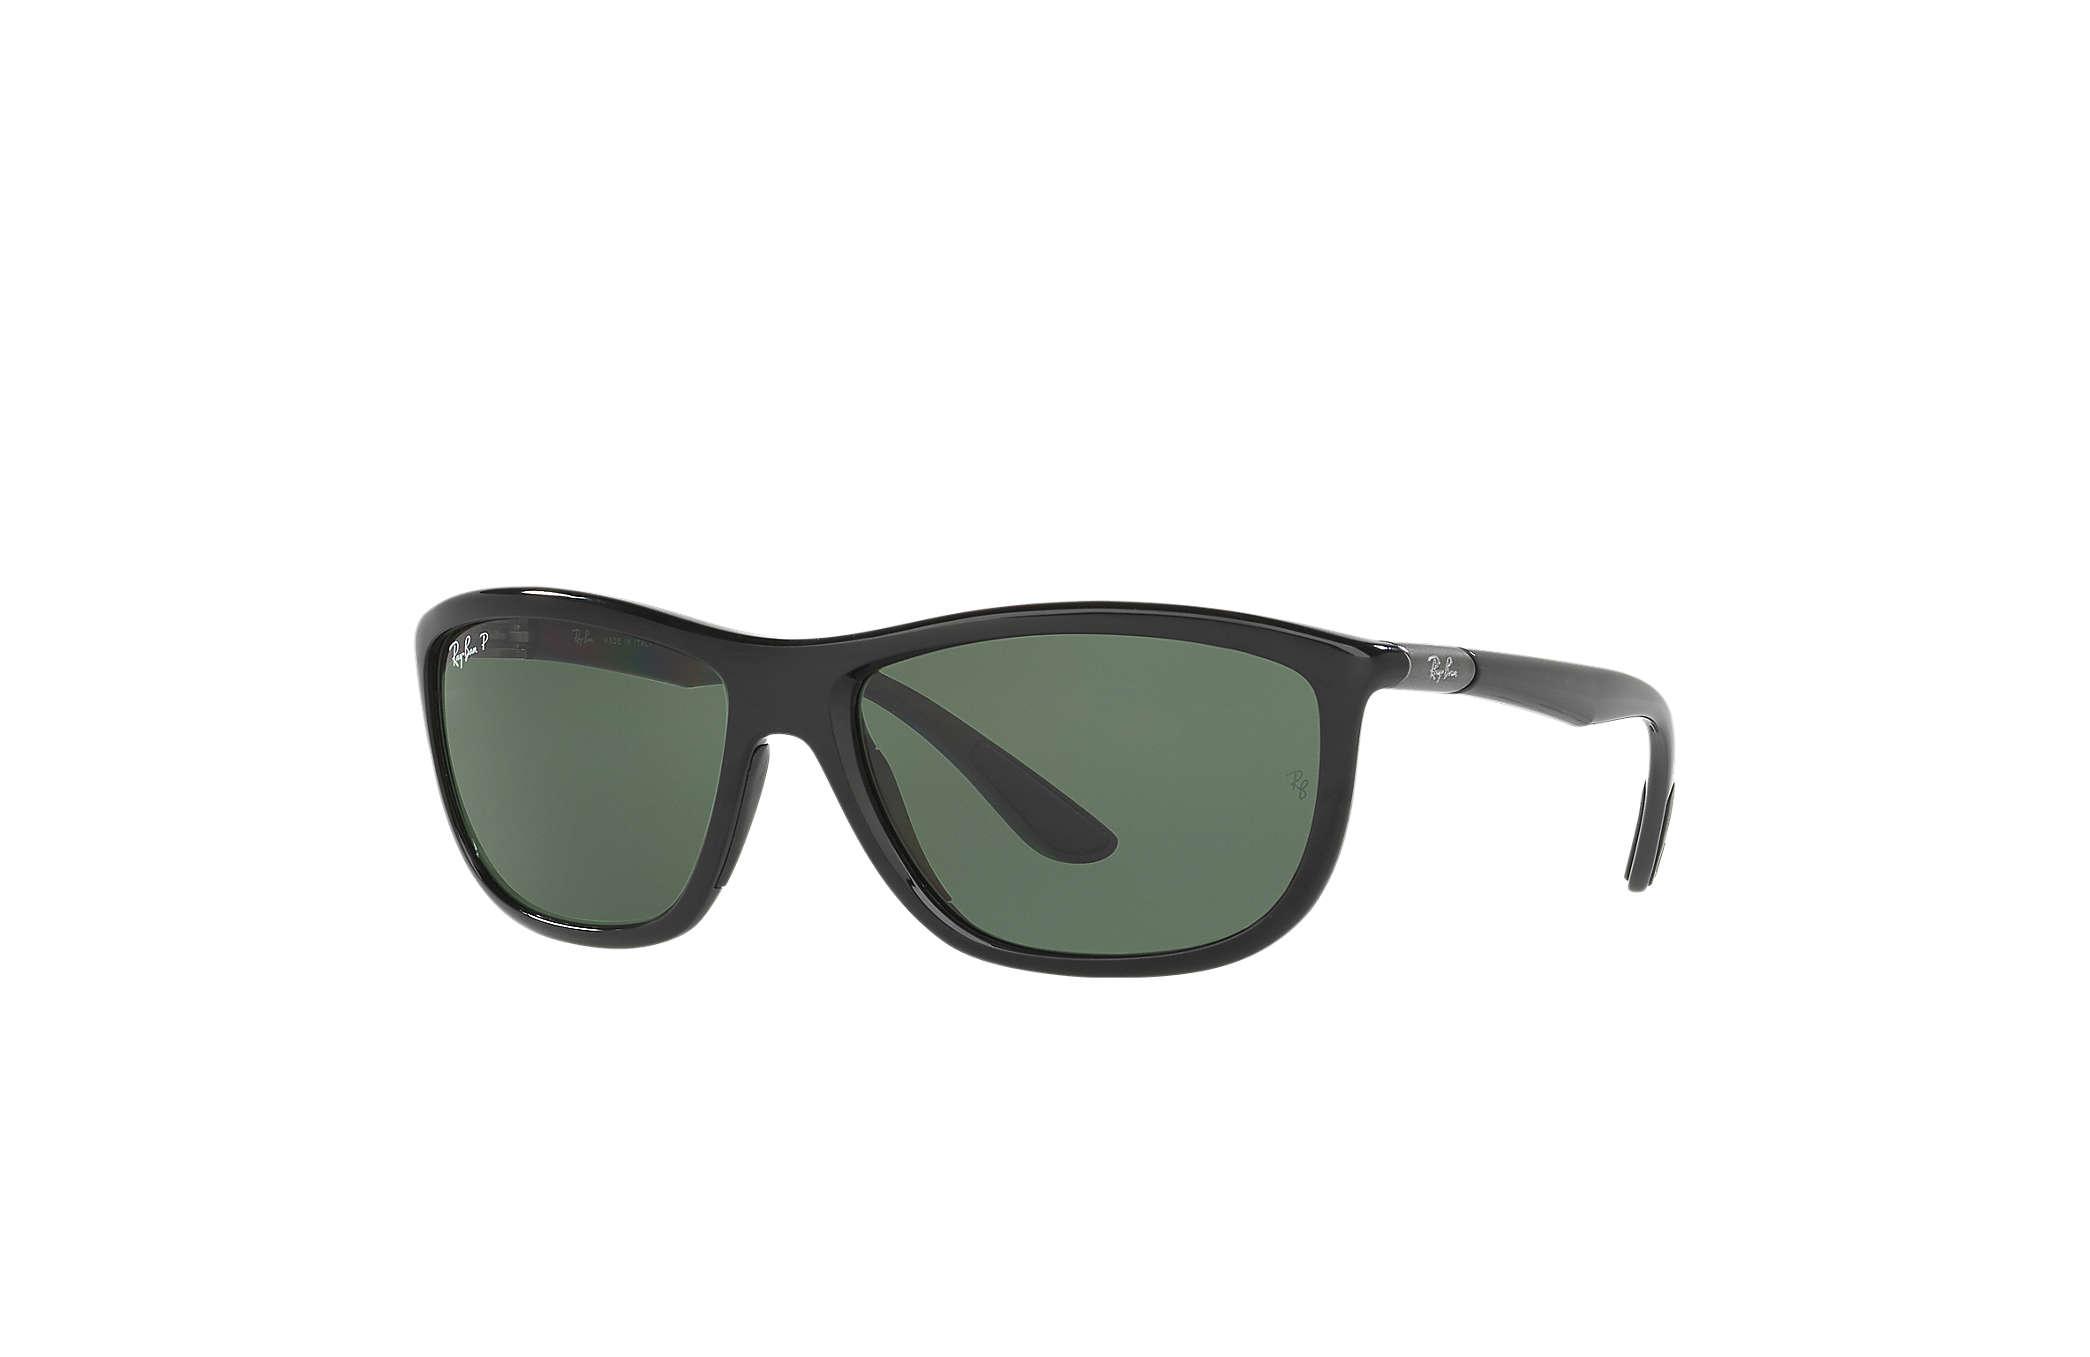 Ray ban sunglasses new design - Ray Ban 0rb8351 Rb8351 Black Grey Sun